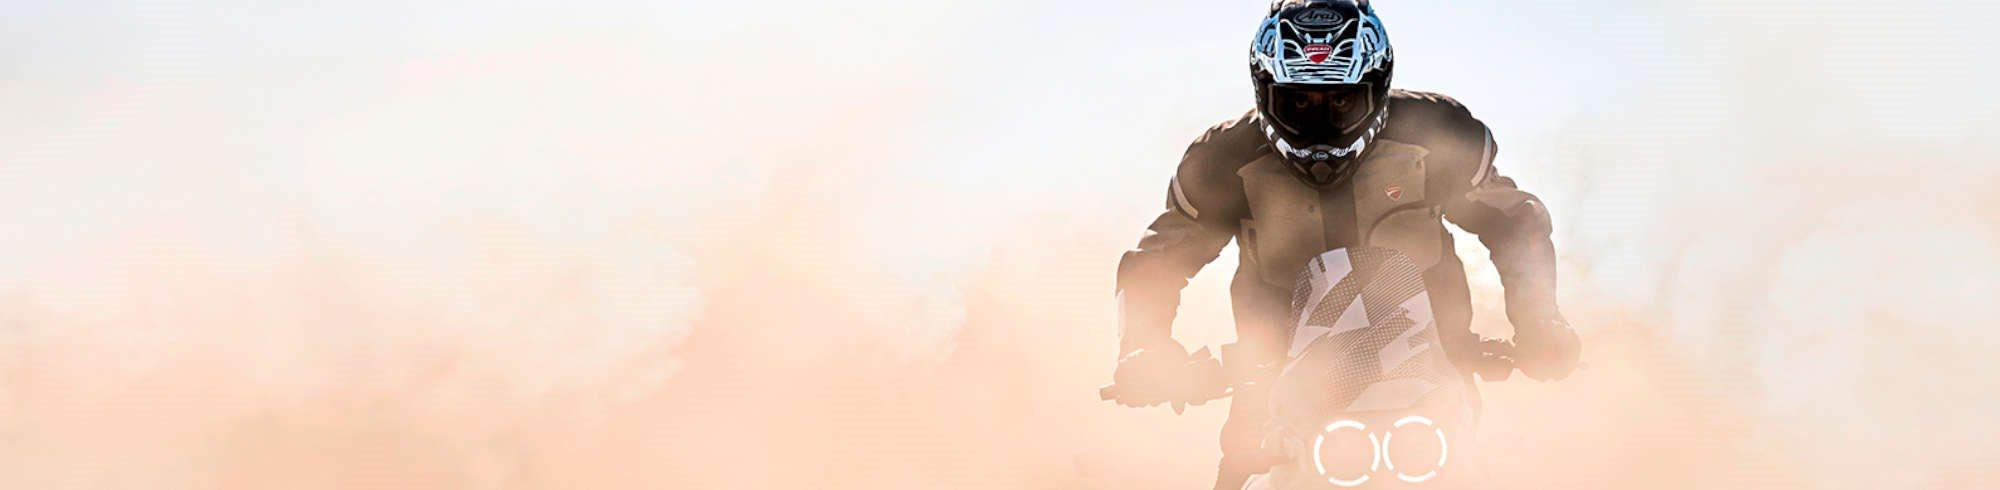 Ducati World Première 2022 9 de diciembre de 2021 - Mantenme informado